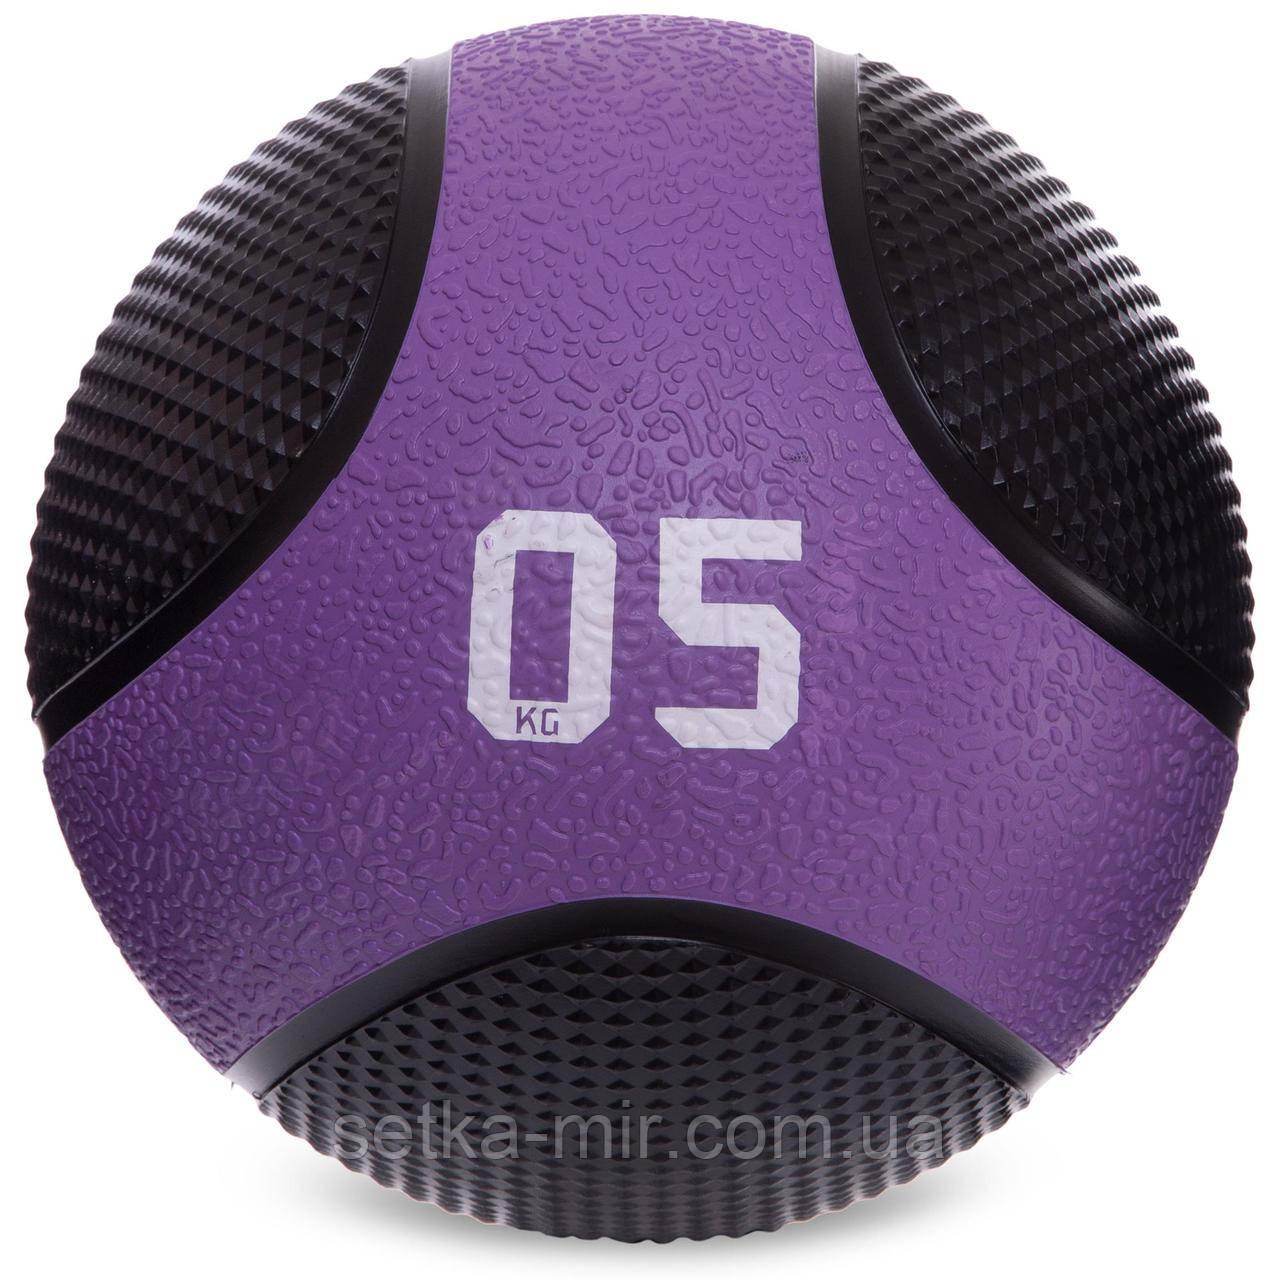 Мяч медицинский медбол Medicine Ball FI-2824-5 5кг